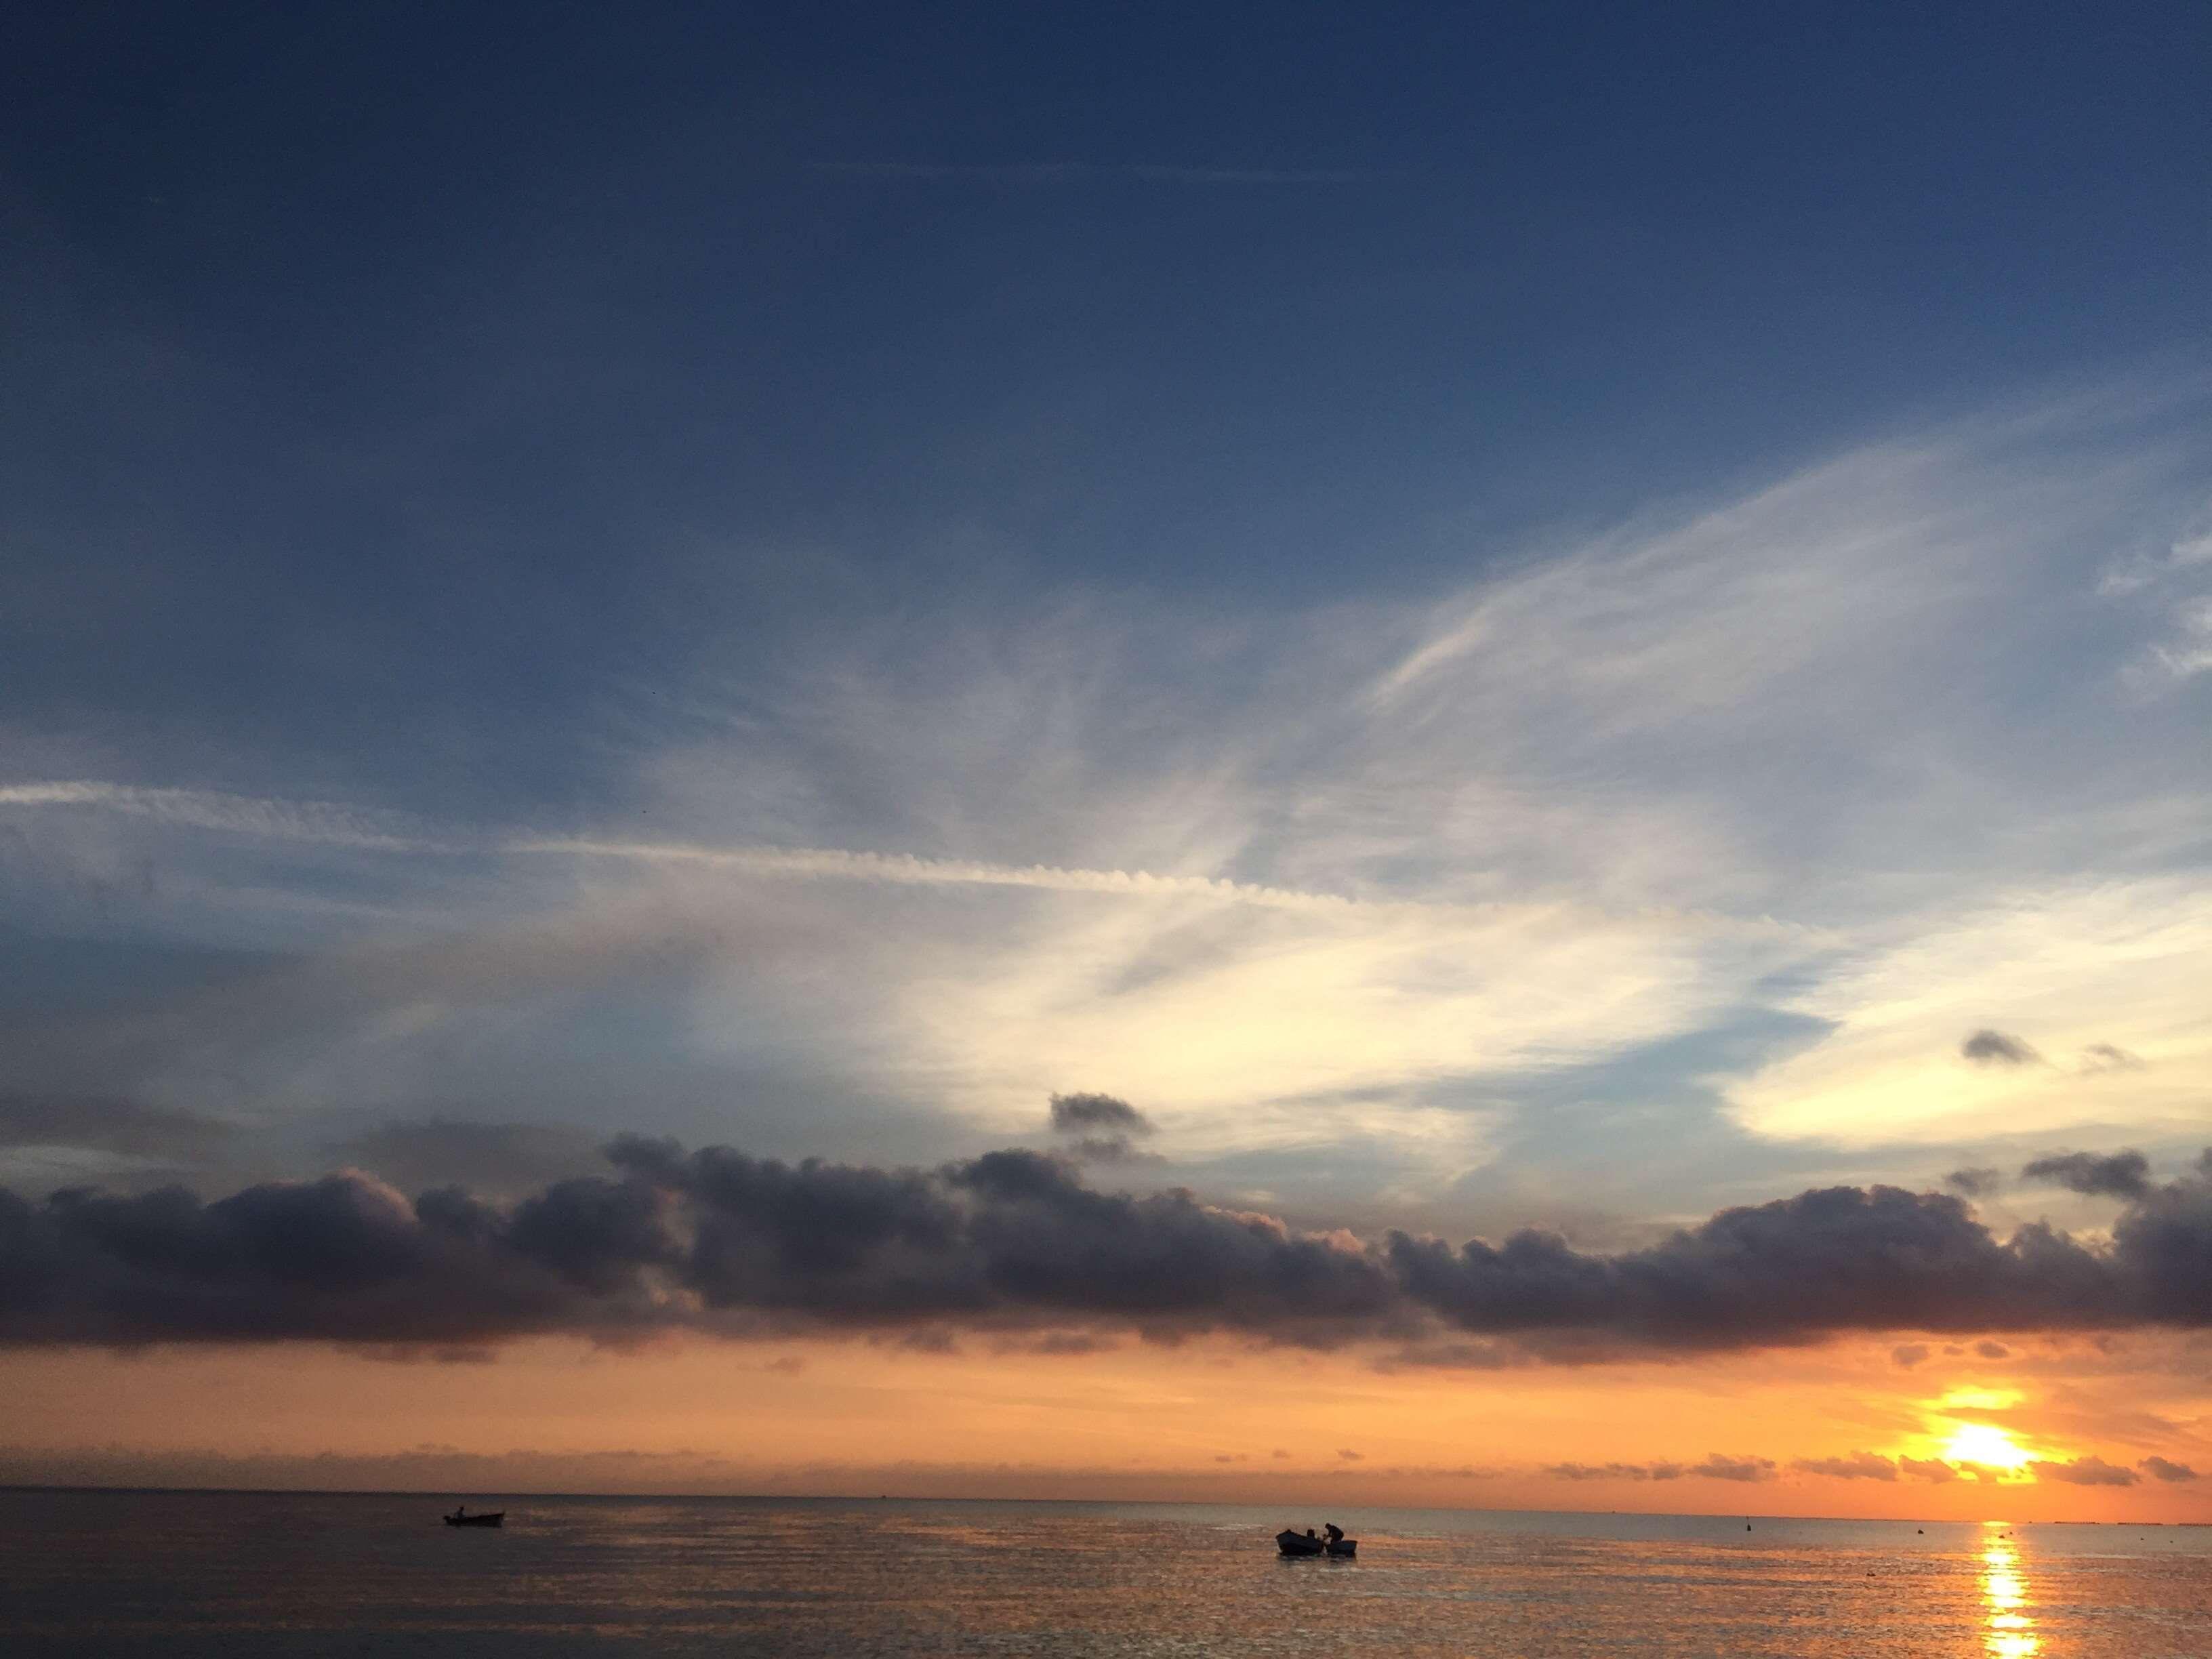 Beach Boats Clouds Cloudy Dawn Dusk Horizon Nature Ocean Reflection Rowboats Sea Seascape Sky Sunrise Sunset Tran Clouds Sunset Clear Blue Sky